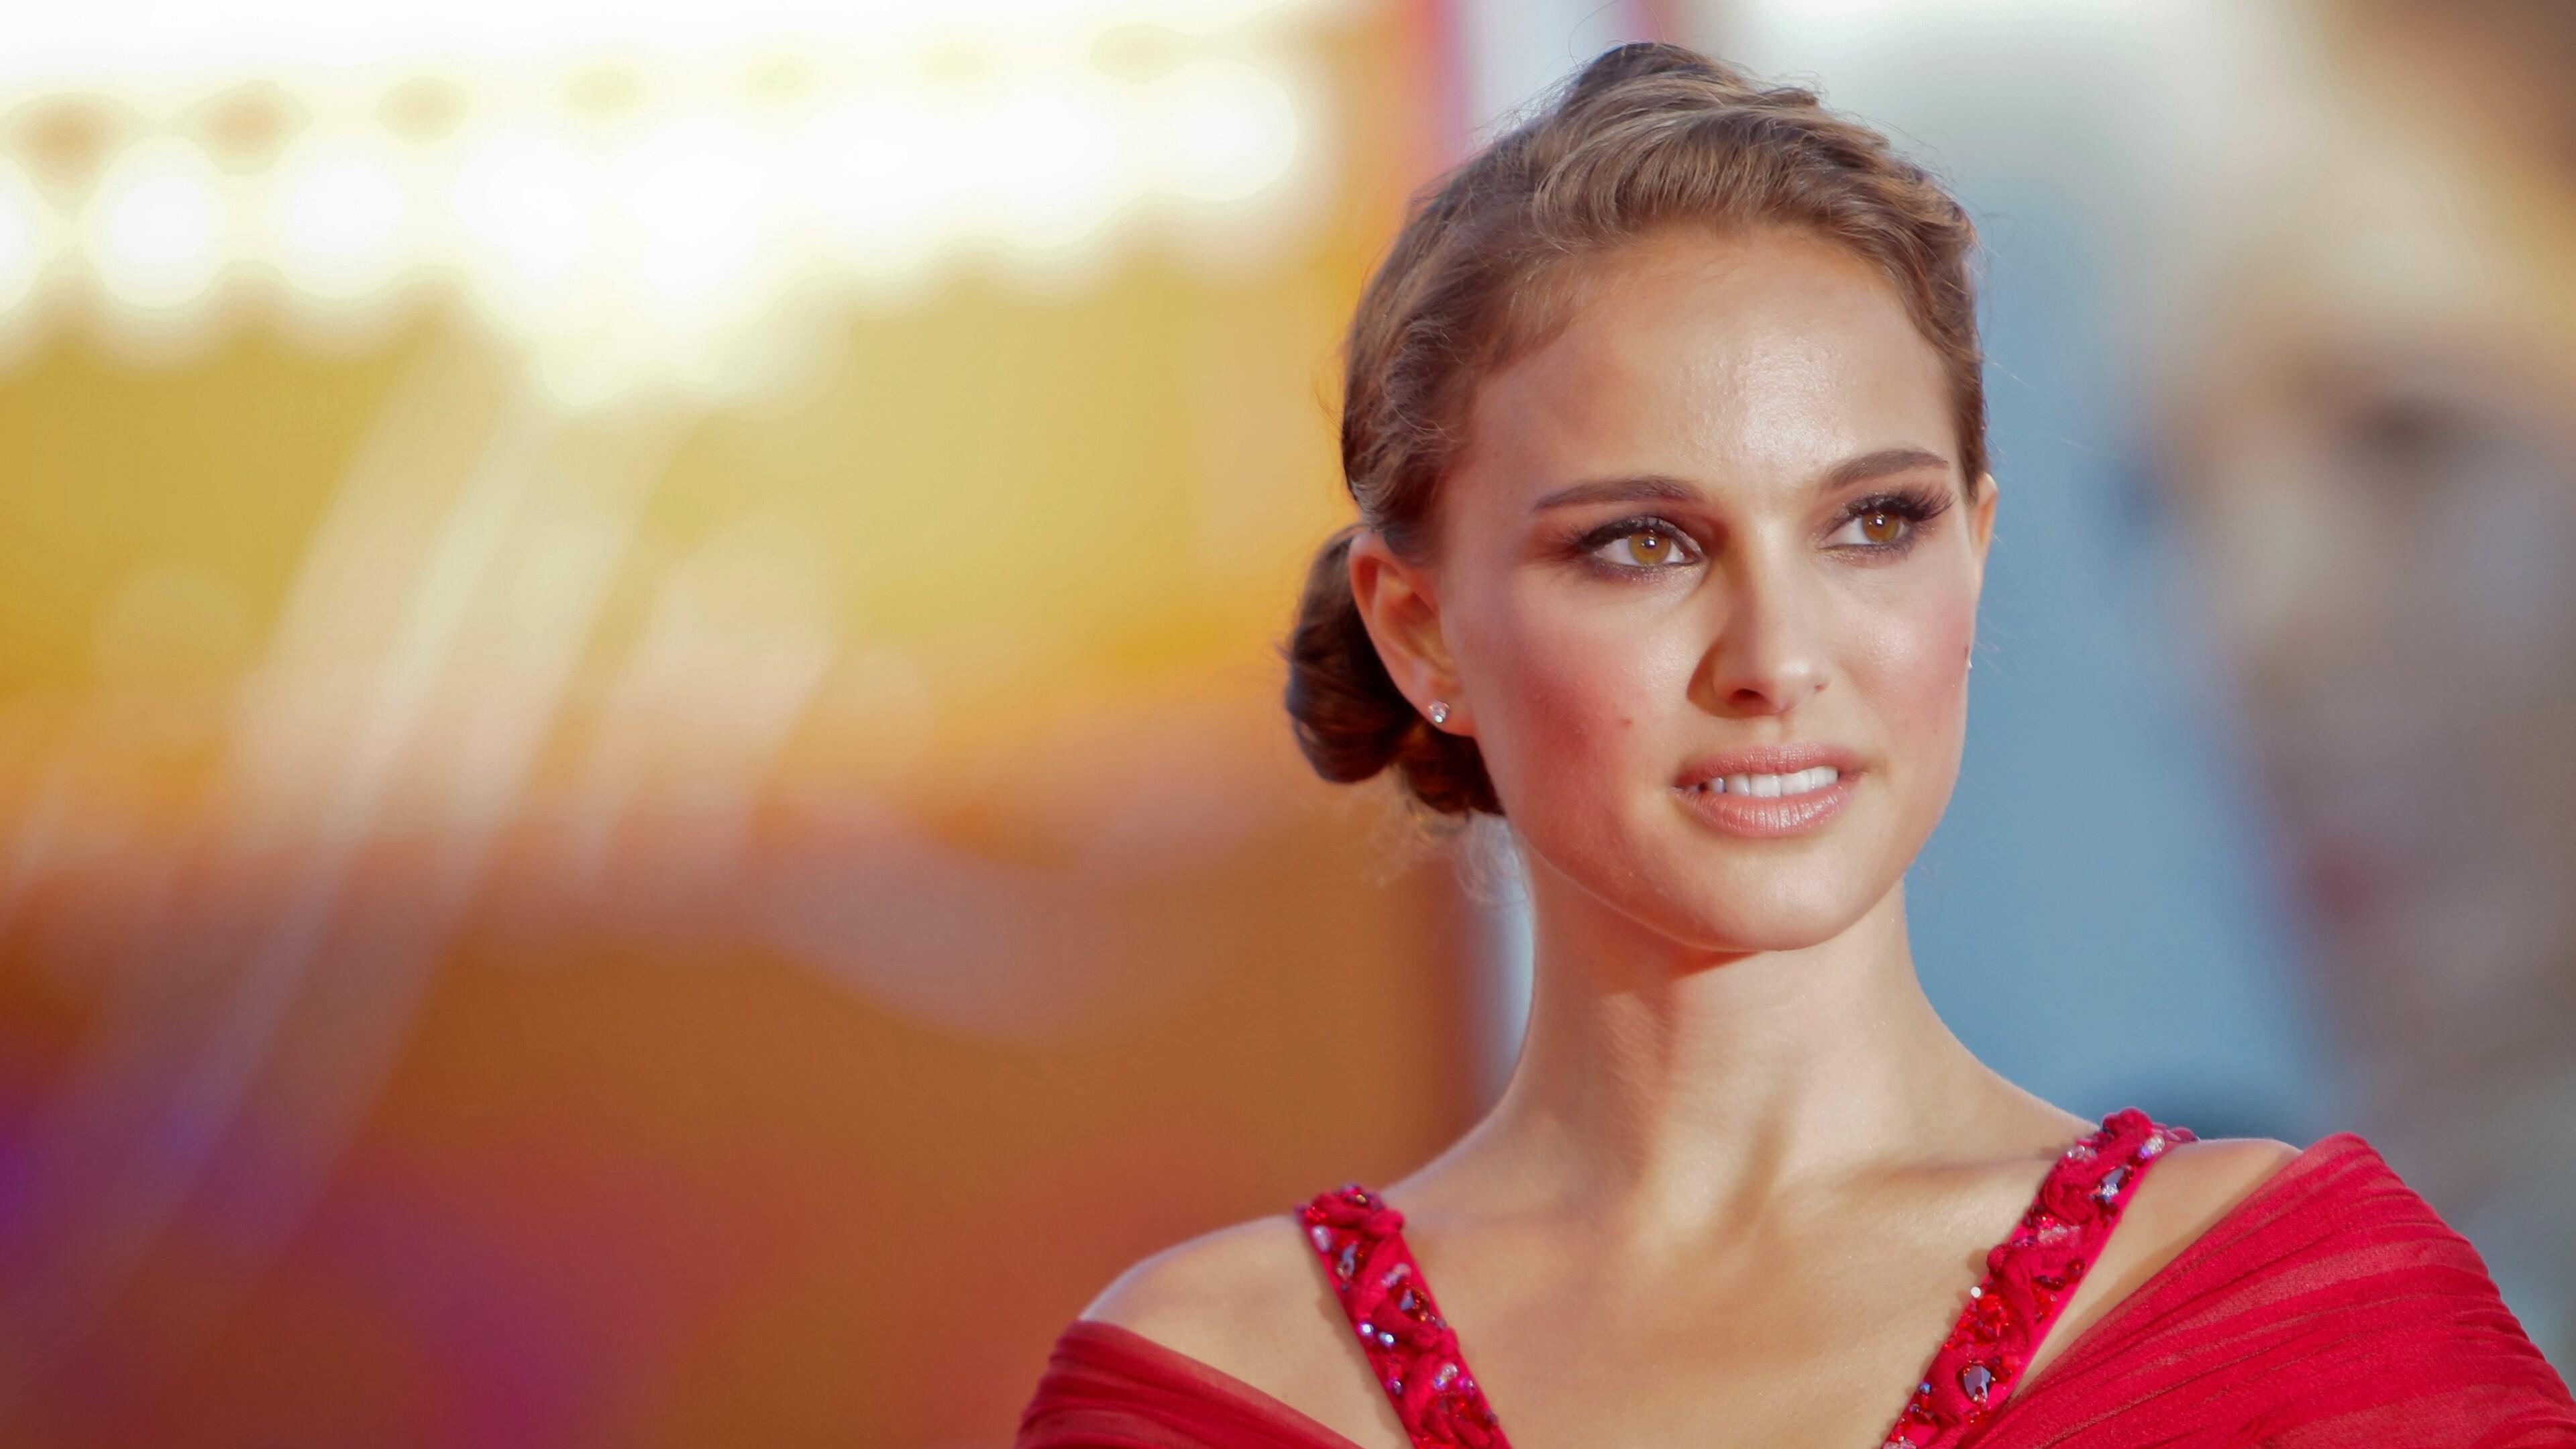 Natalie Portman Wallpapers - GeekShizzle